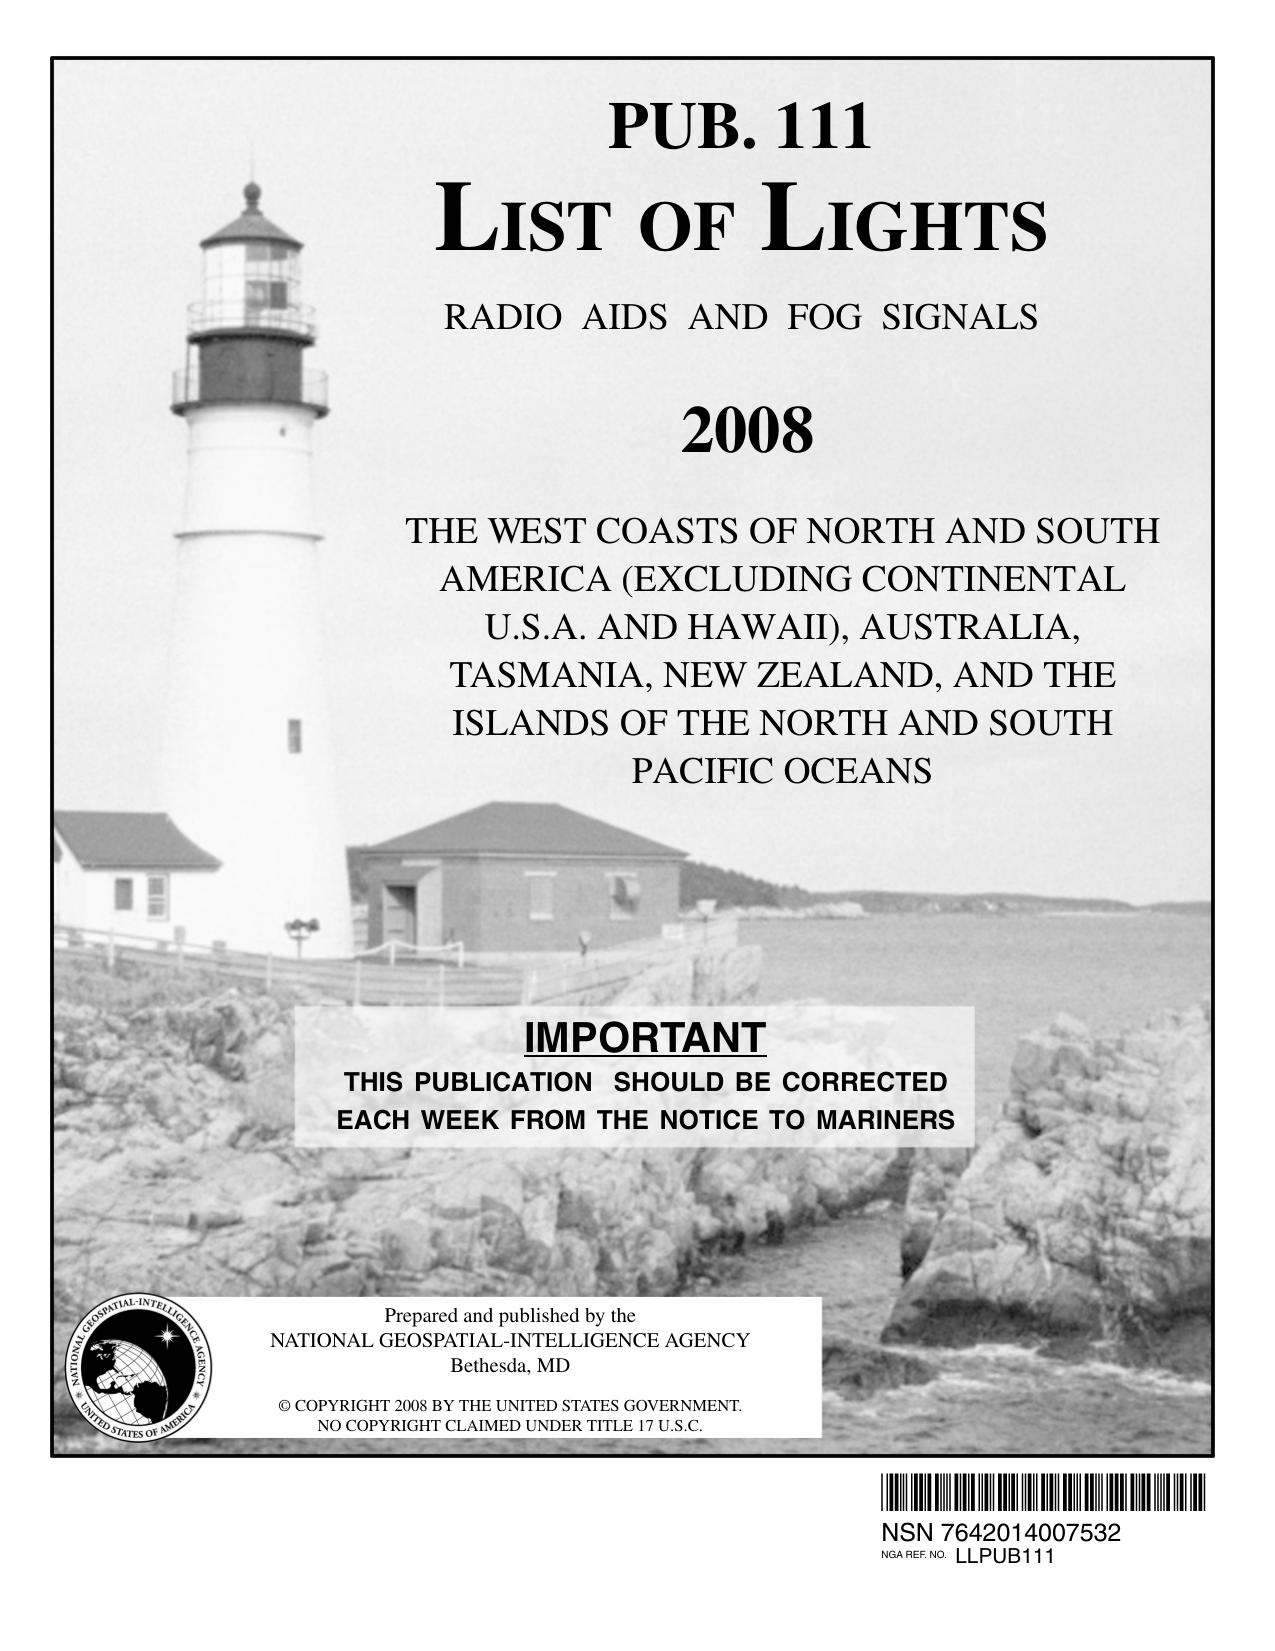 LIST OF LIGHTS | manualzz com